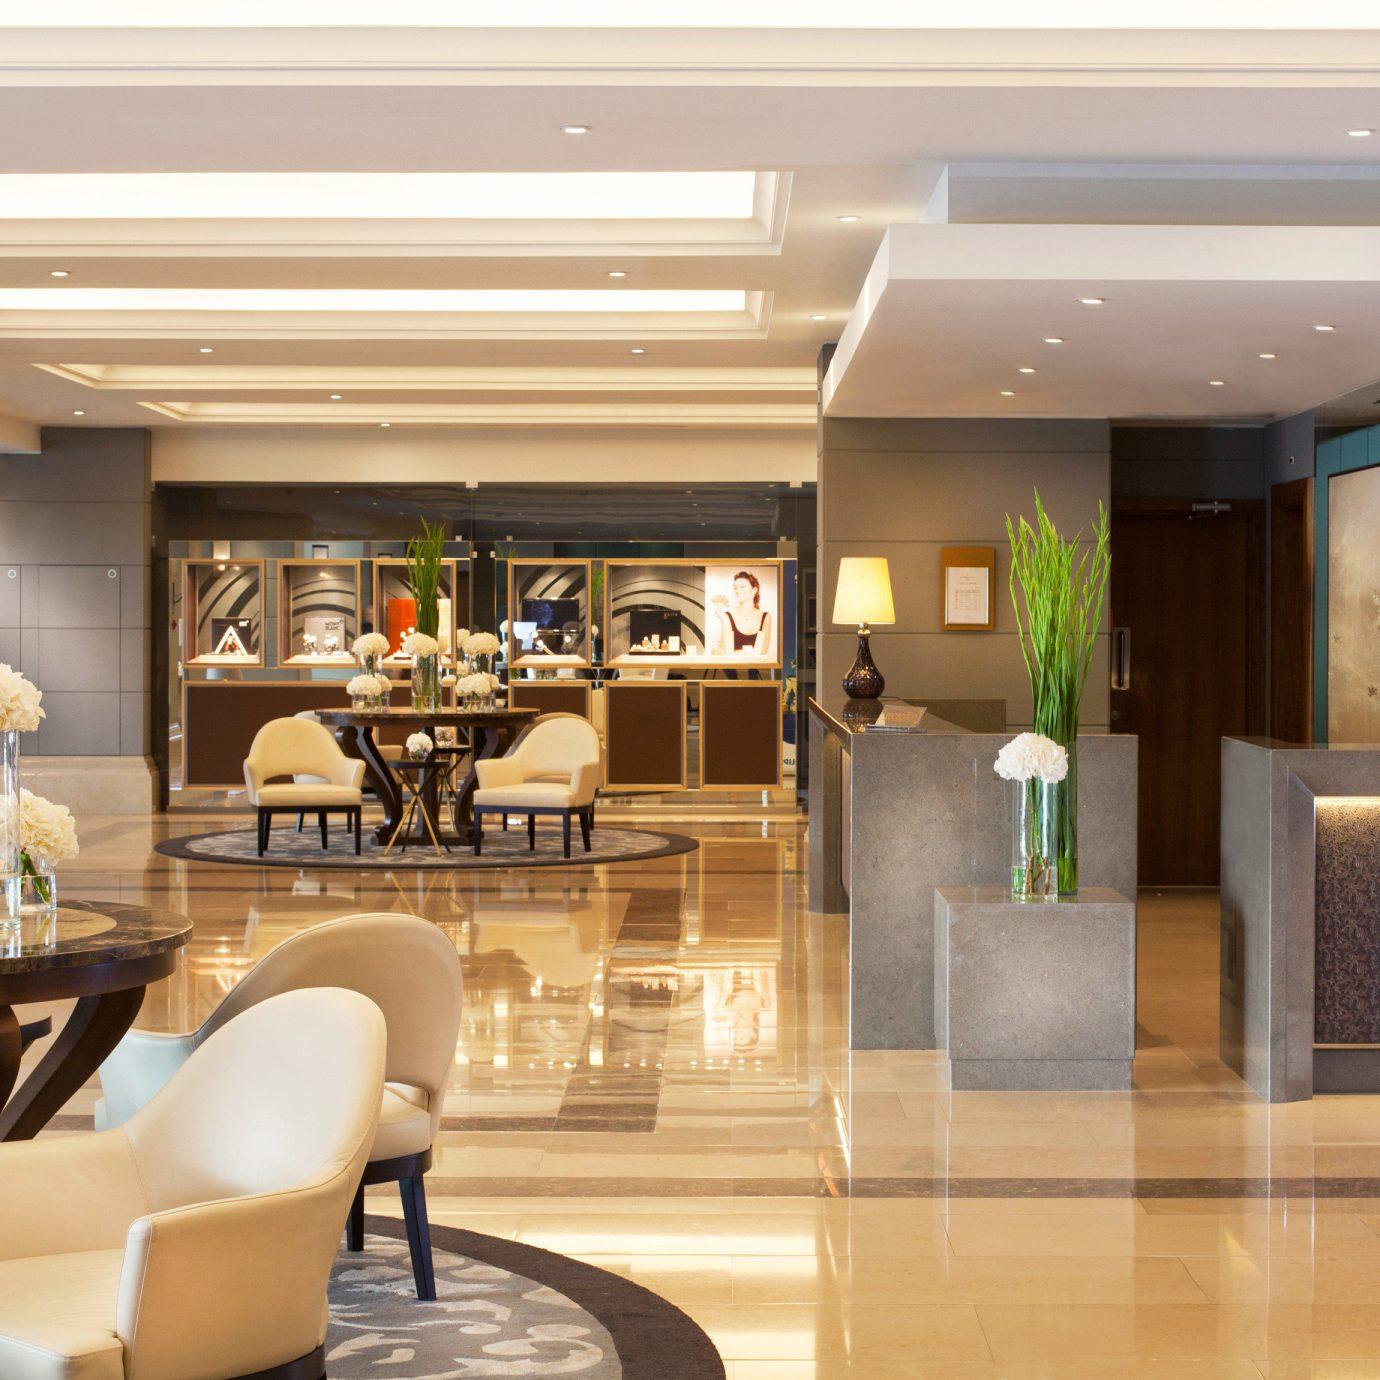 Lobby Lounge Resort property living room home condominium lighting dining table